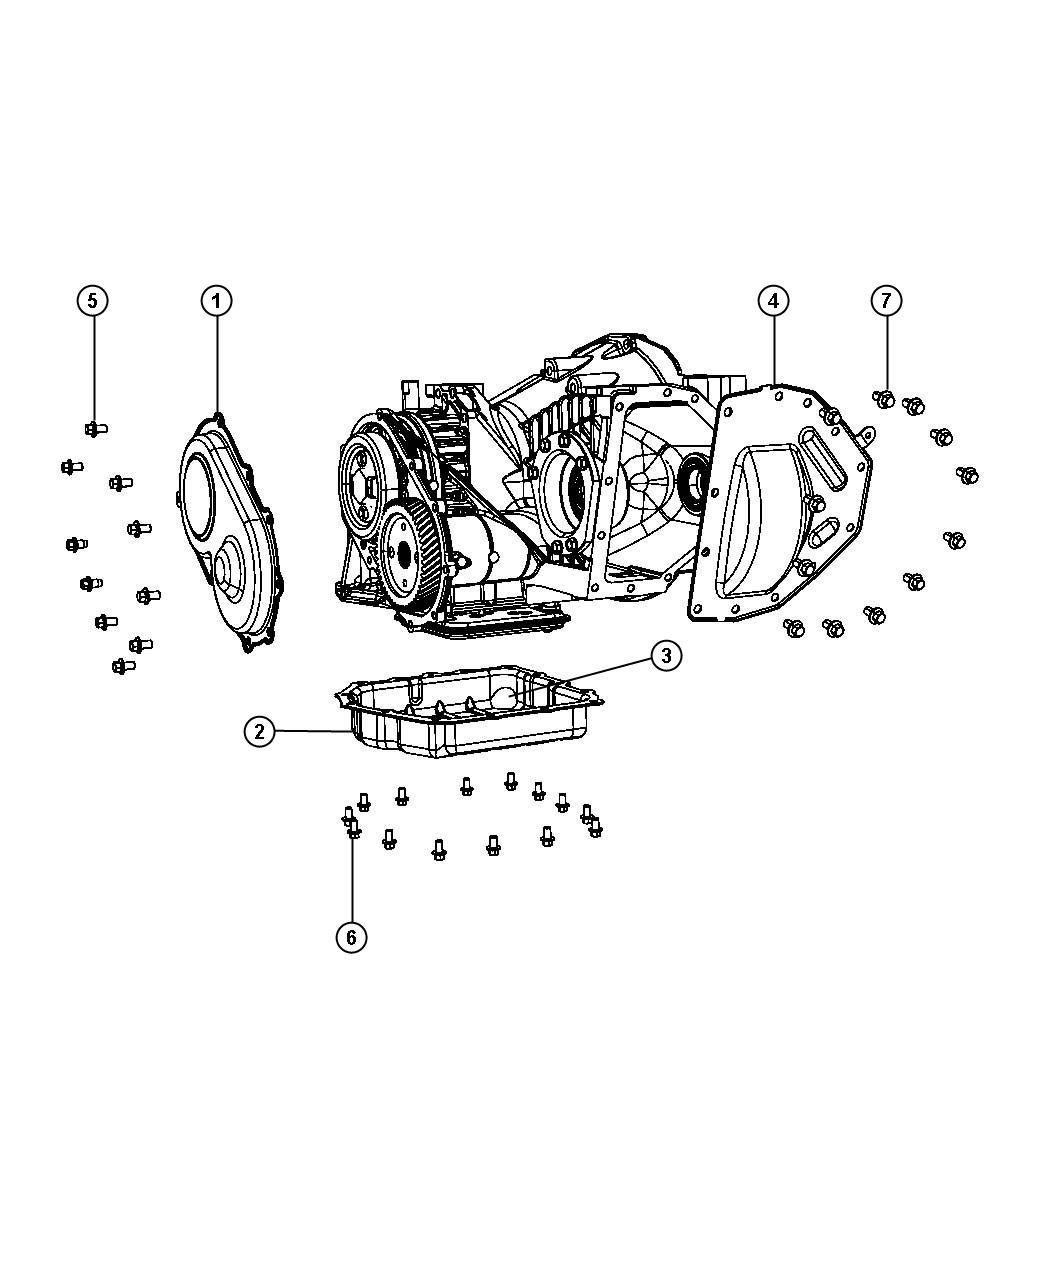 2012 Dodge Avenger Pan. Transaxle differential oil